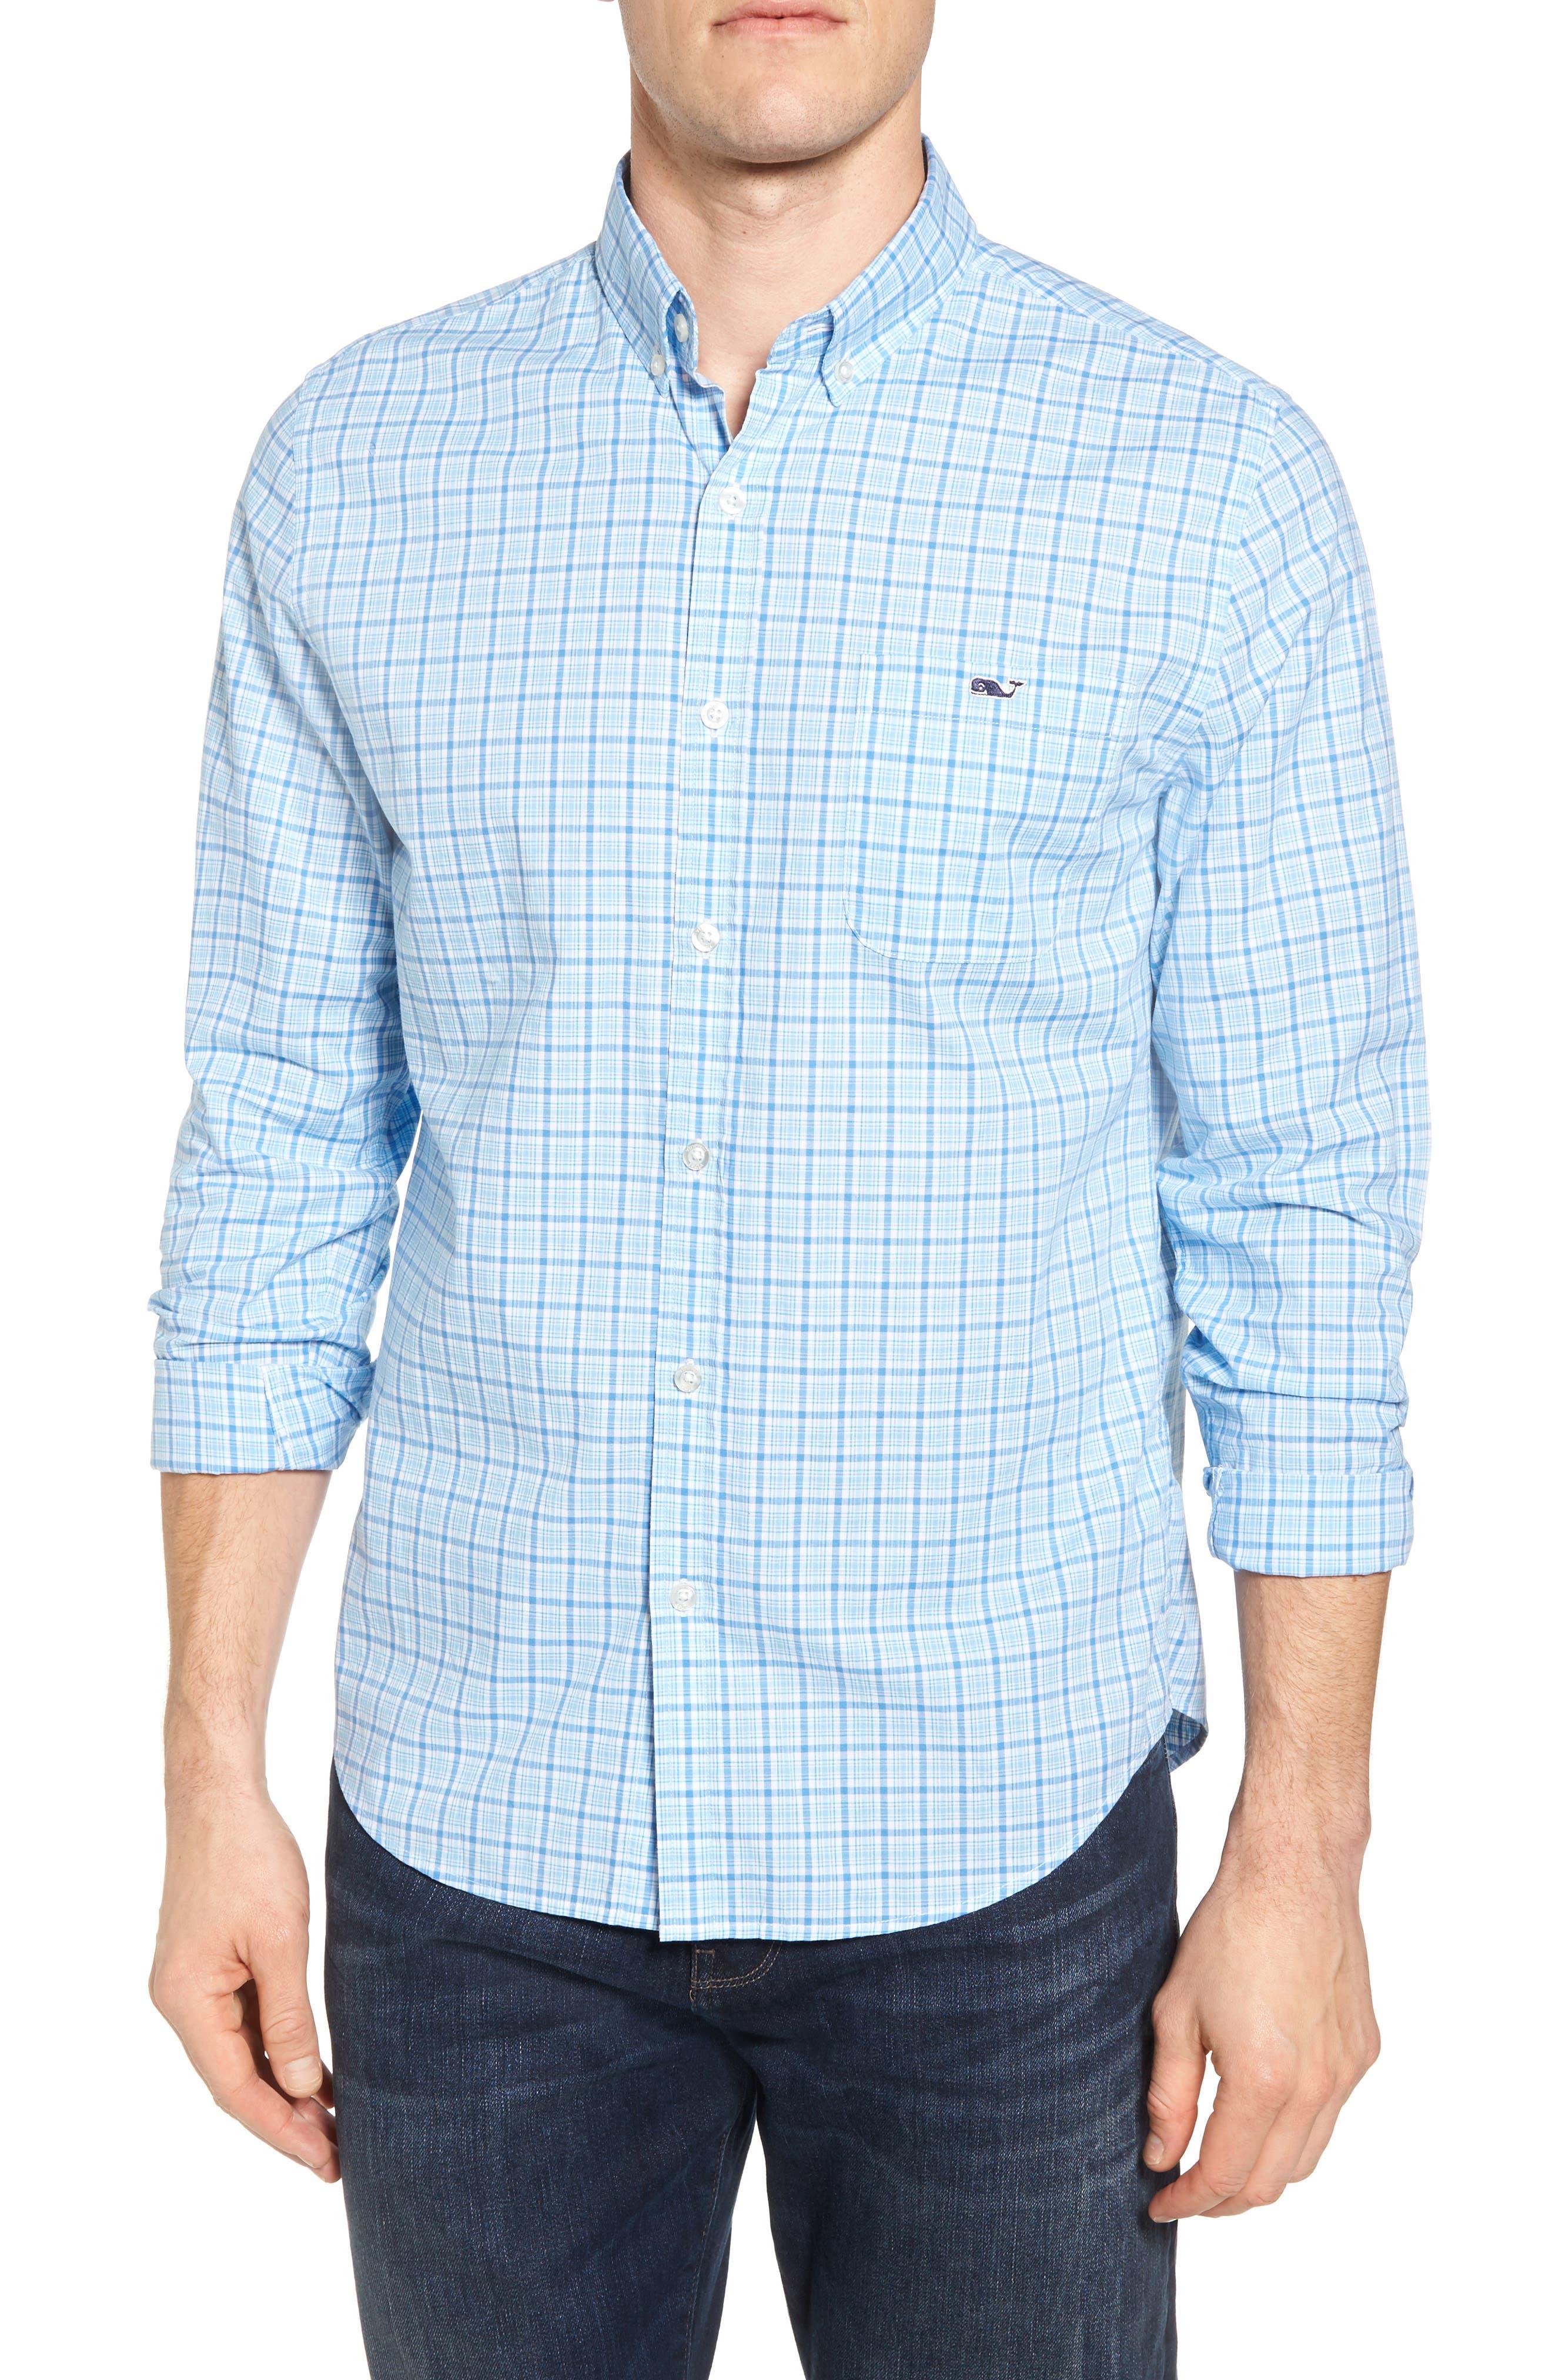 Seawatch Slim Fit Plaid Sport Shirt,                             Main thumbnail 1, color,                             459